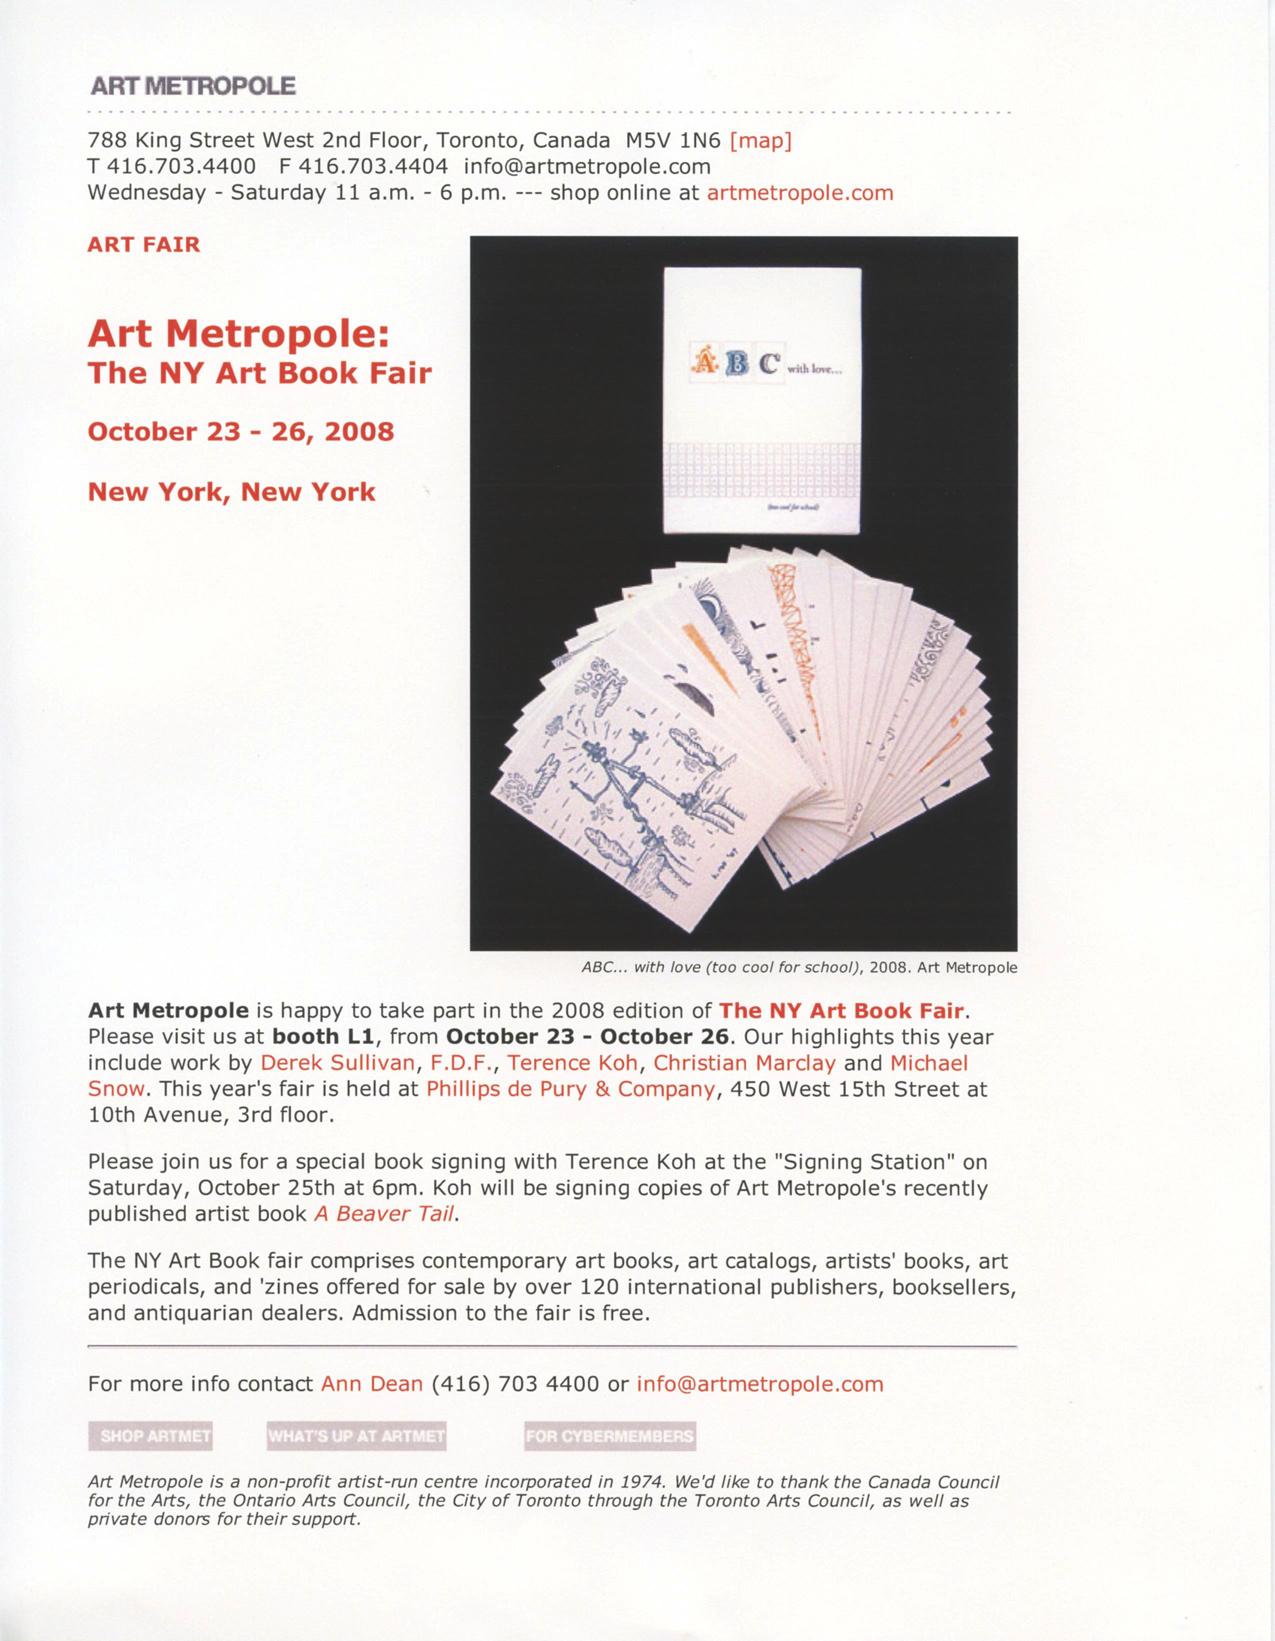 Art Metropole at the NY Art Book Fair.